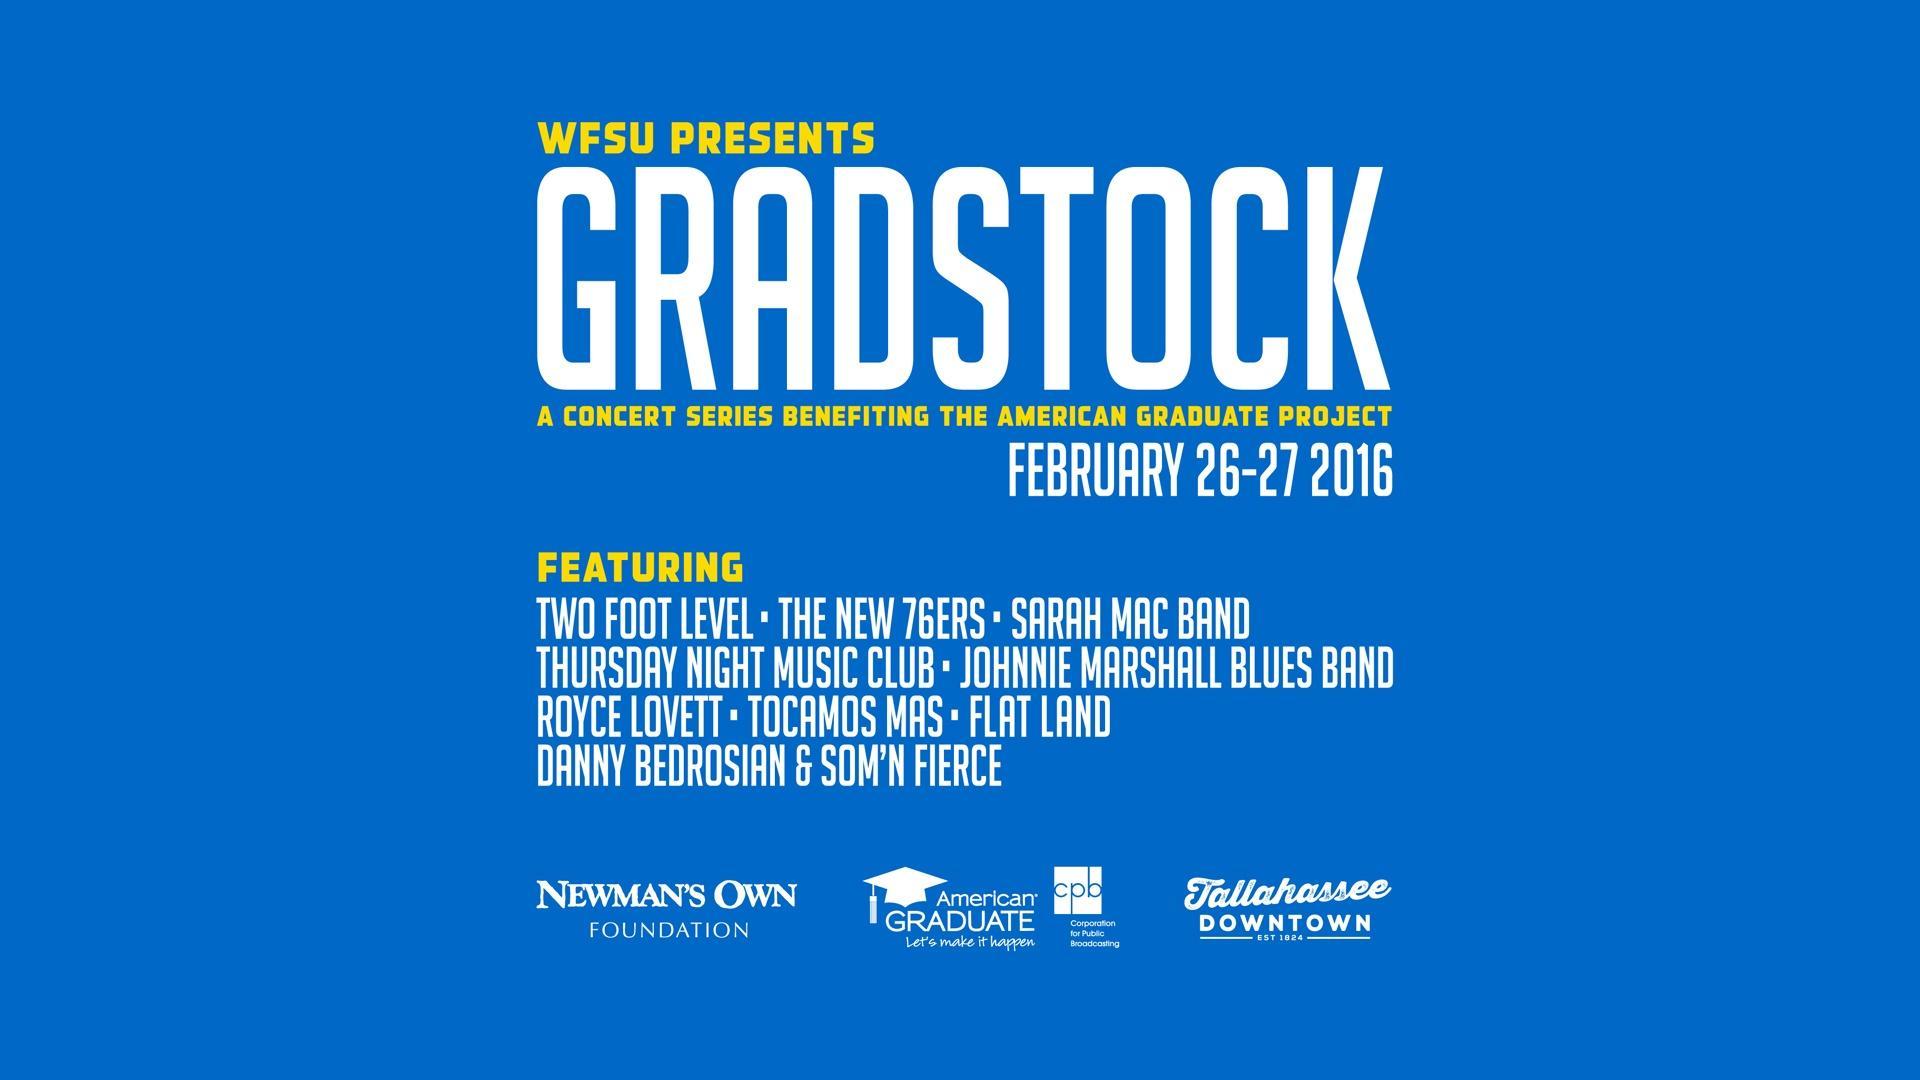 GRADSTOCK: A Concert Series Benefiting American Graduate